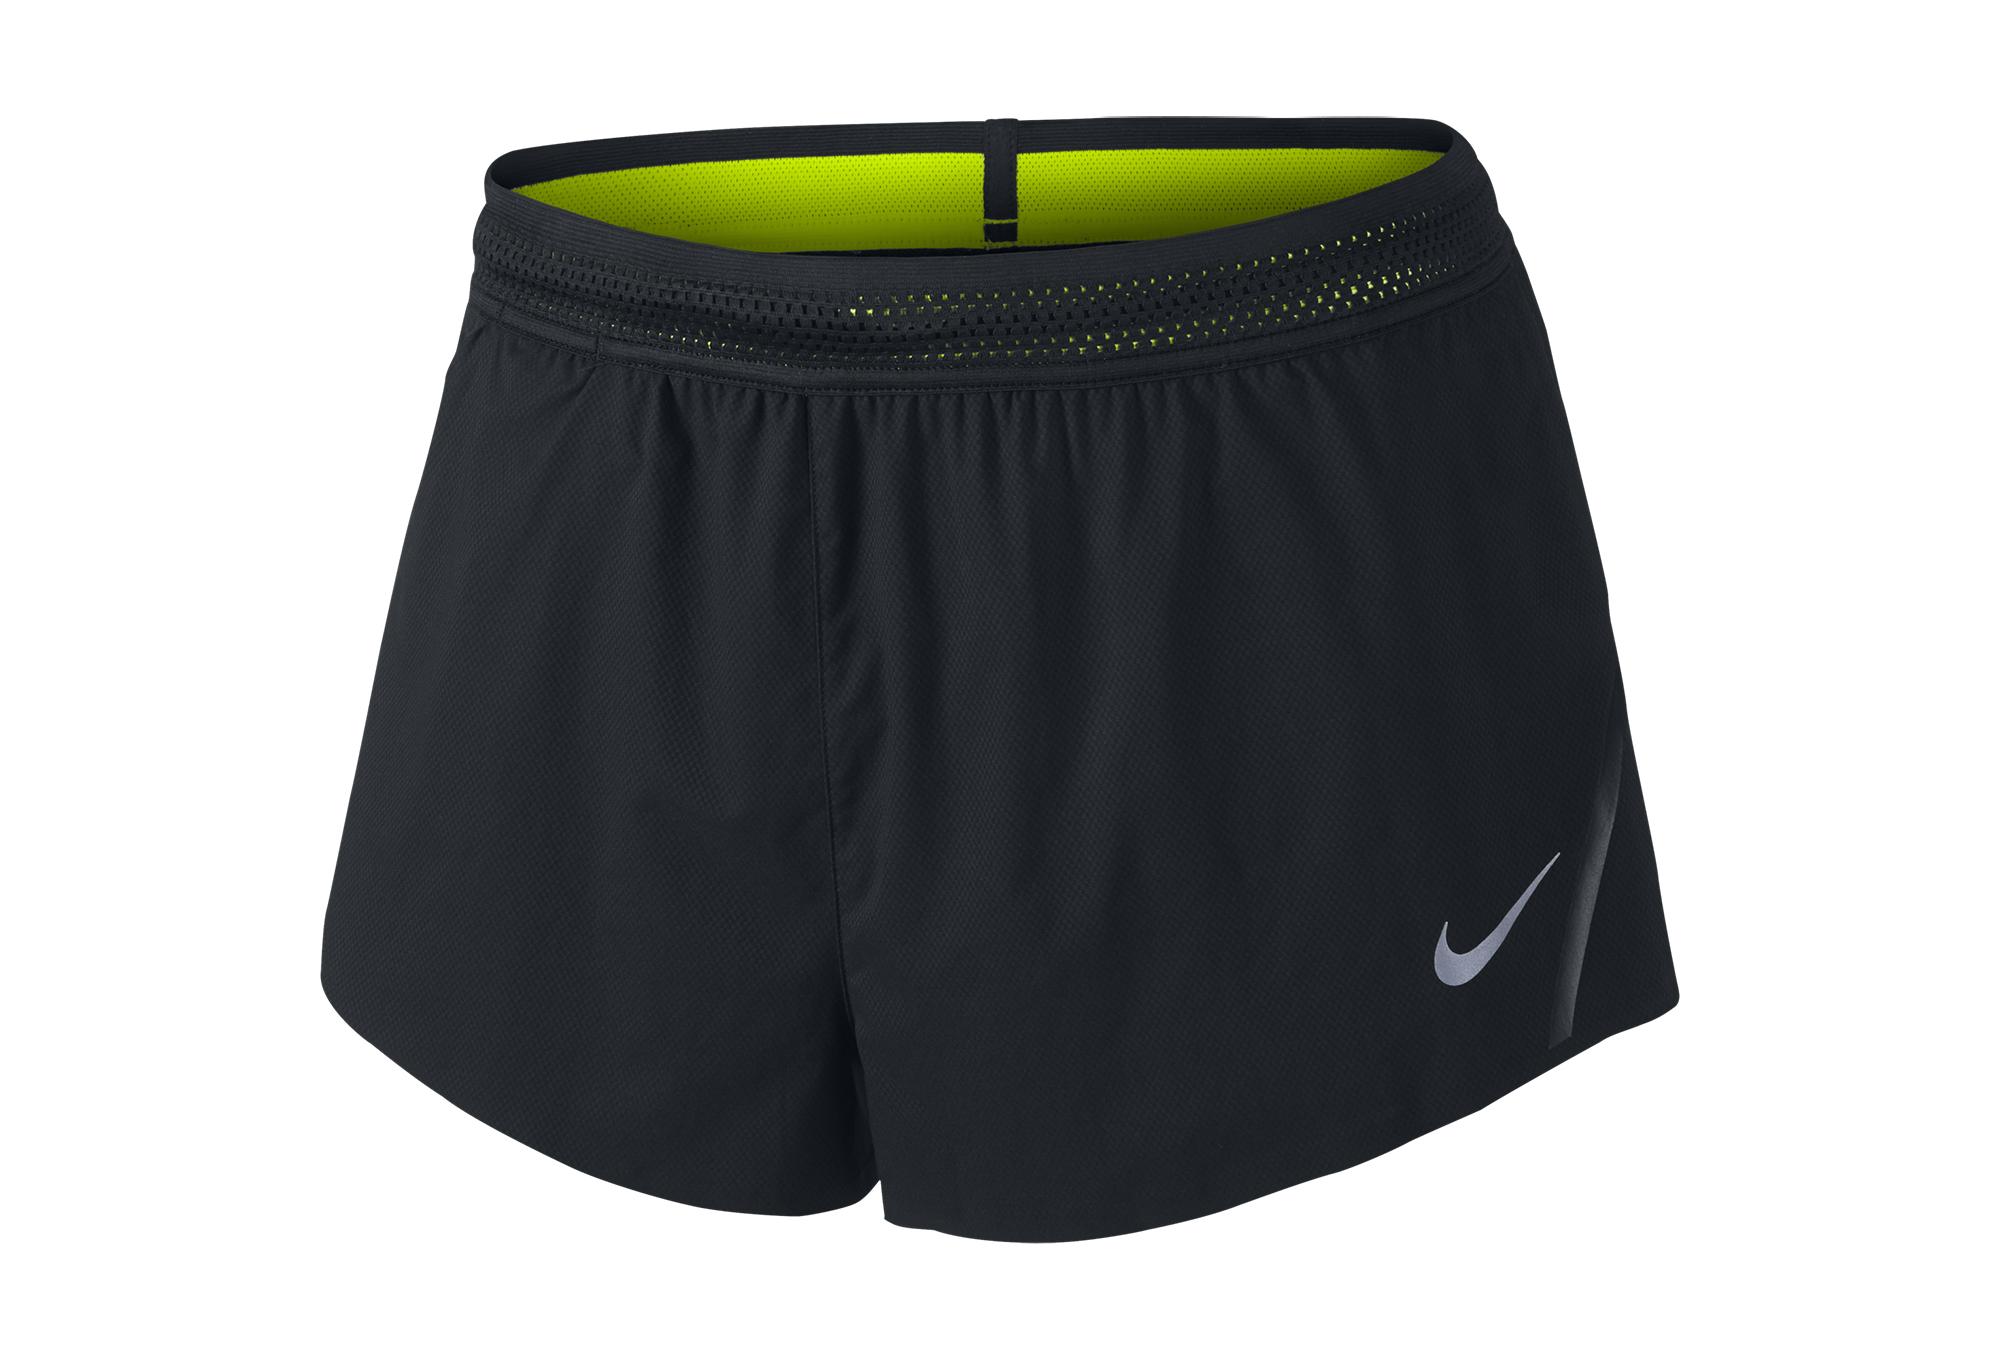 Comprensión Horno lote  Nike Aeroswift Shorts Reviewed & Rated in 2020 | WalkJogRun